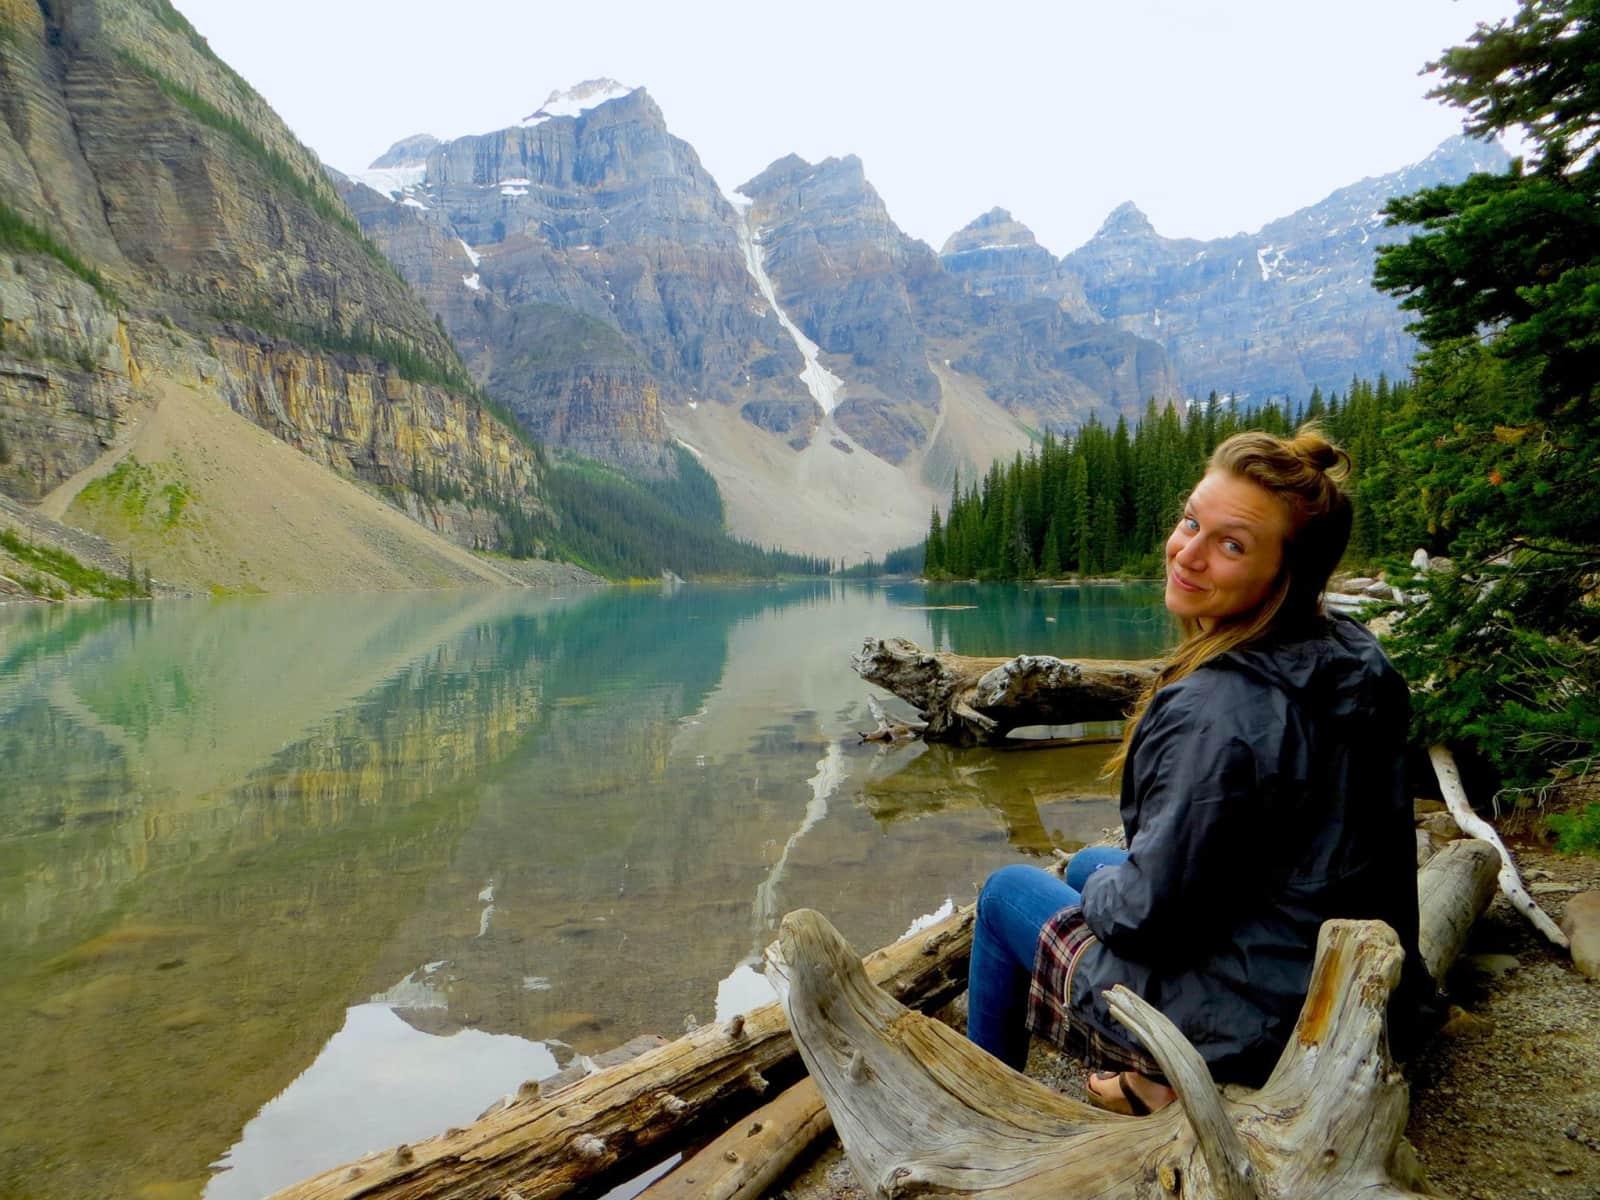 Erin from Calgary, Alberta, Canada